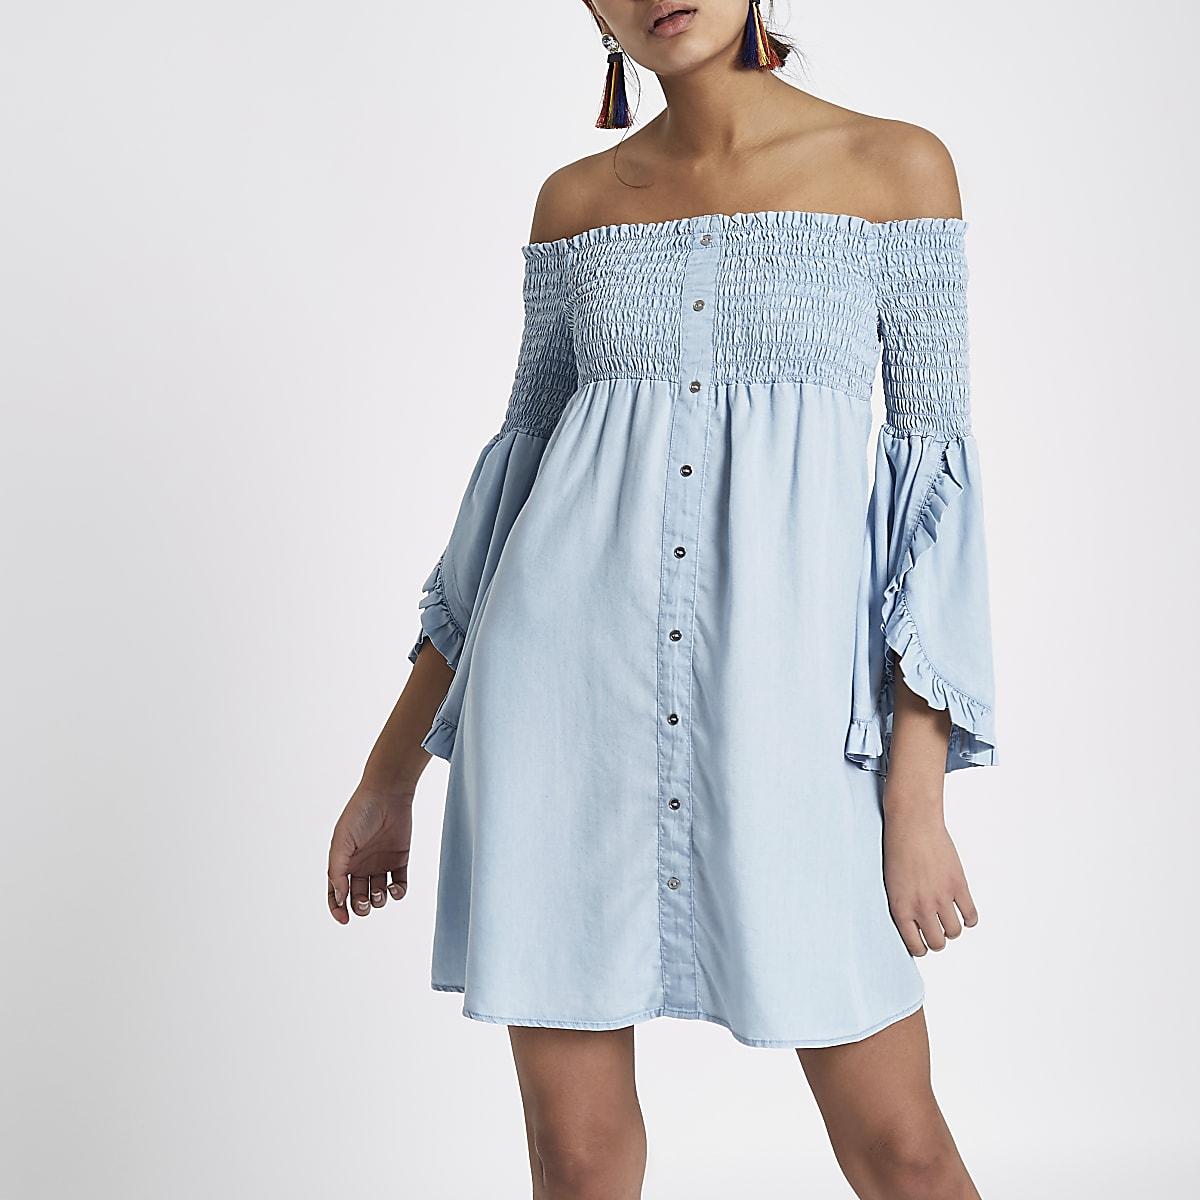 7deea644d6e Light blue shirred bardot denim swing dress - Swing Dresses - Dresses -  women